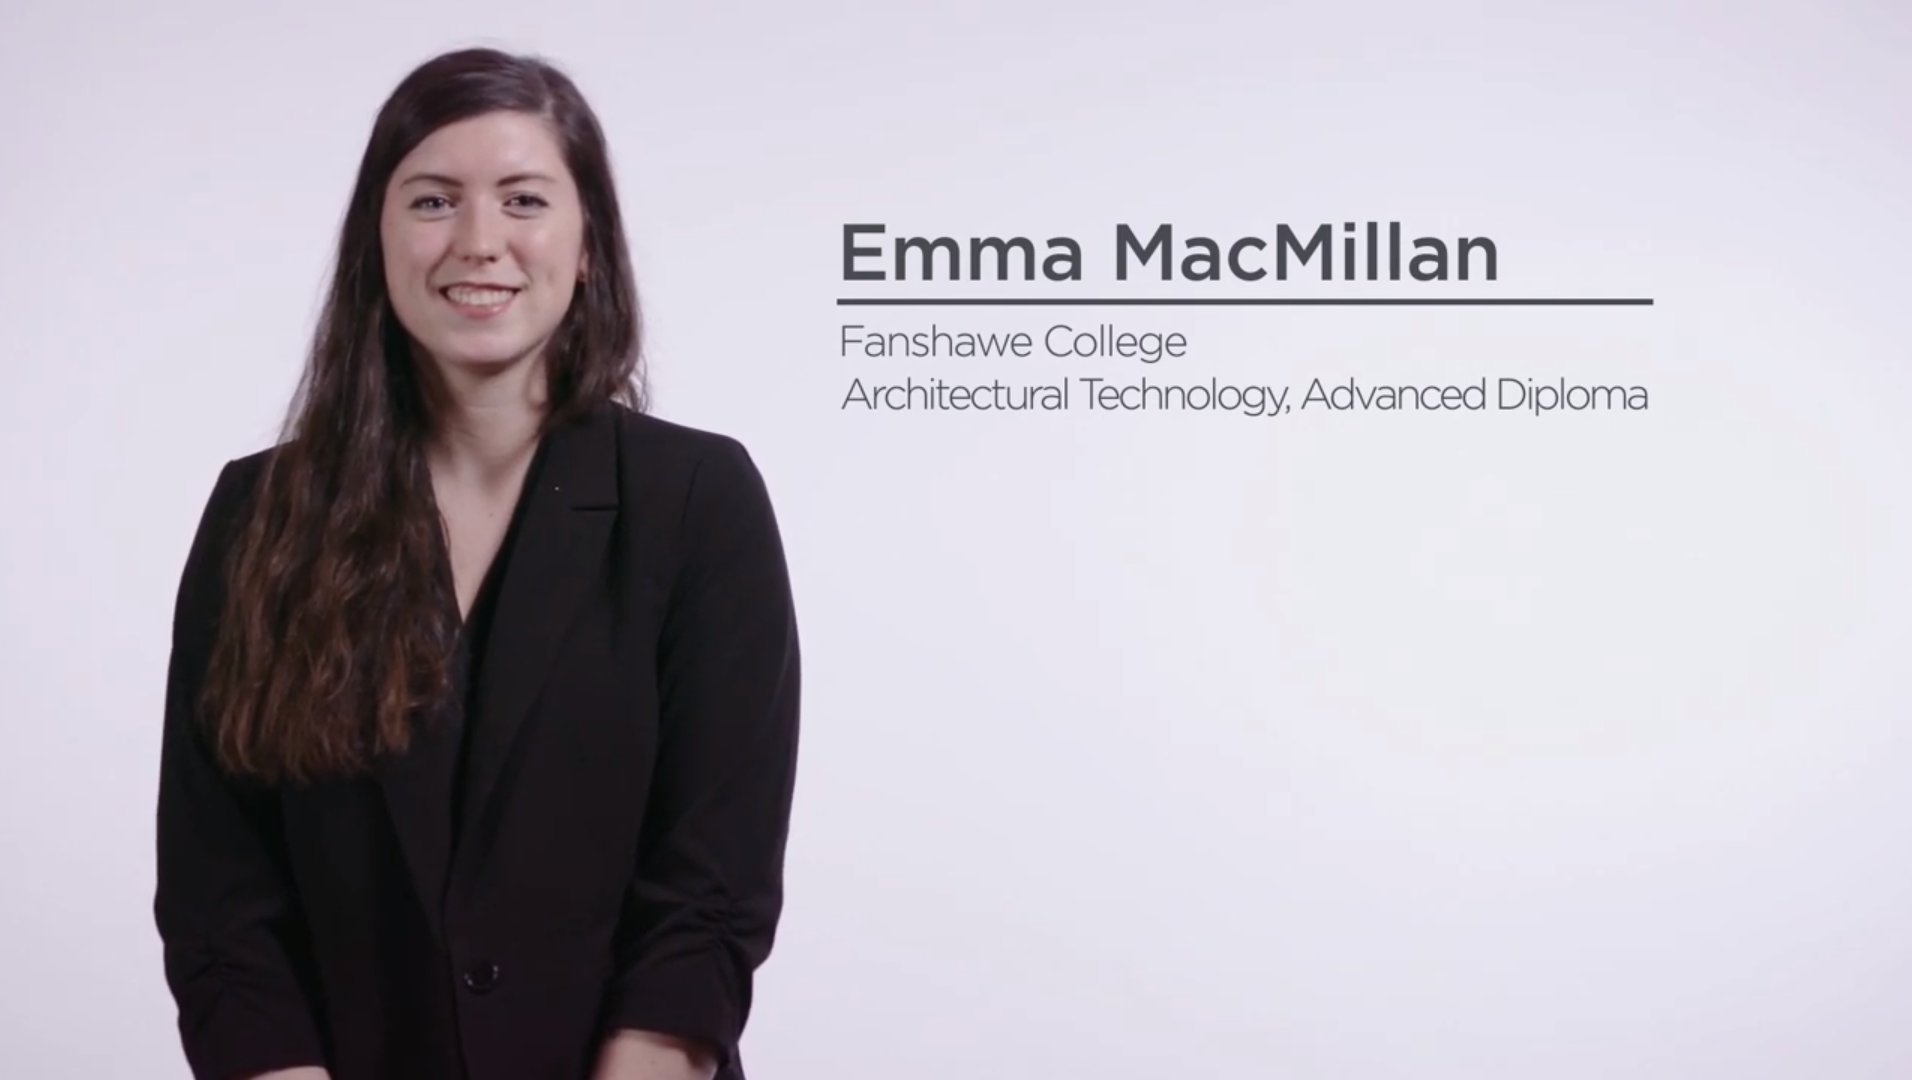 Emma MacMillan